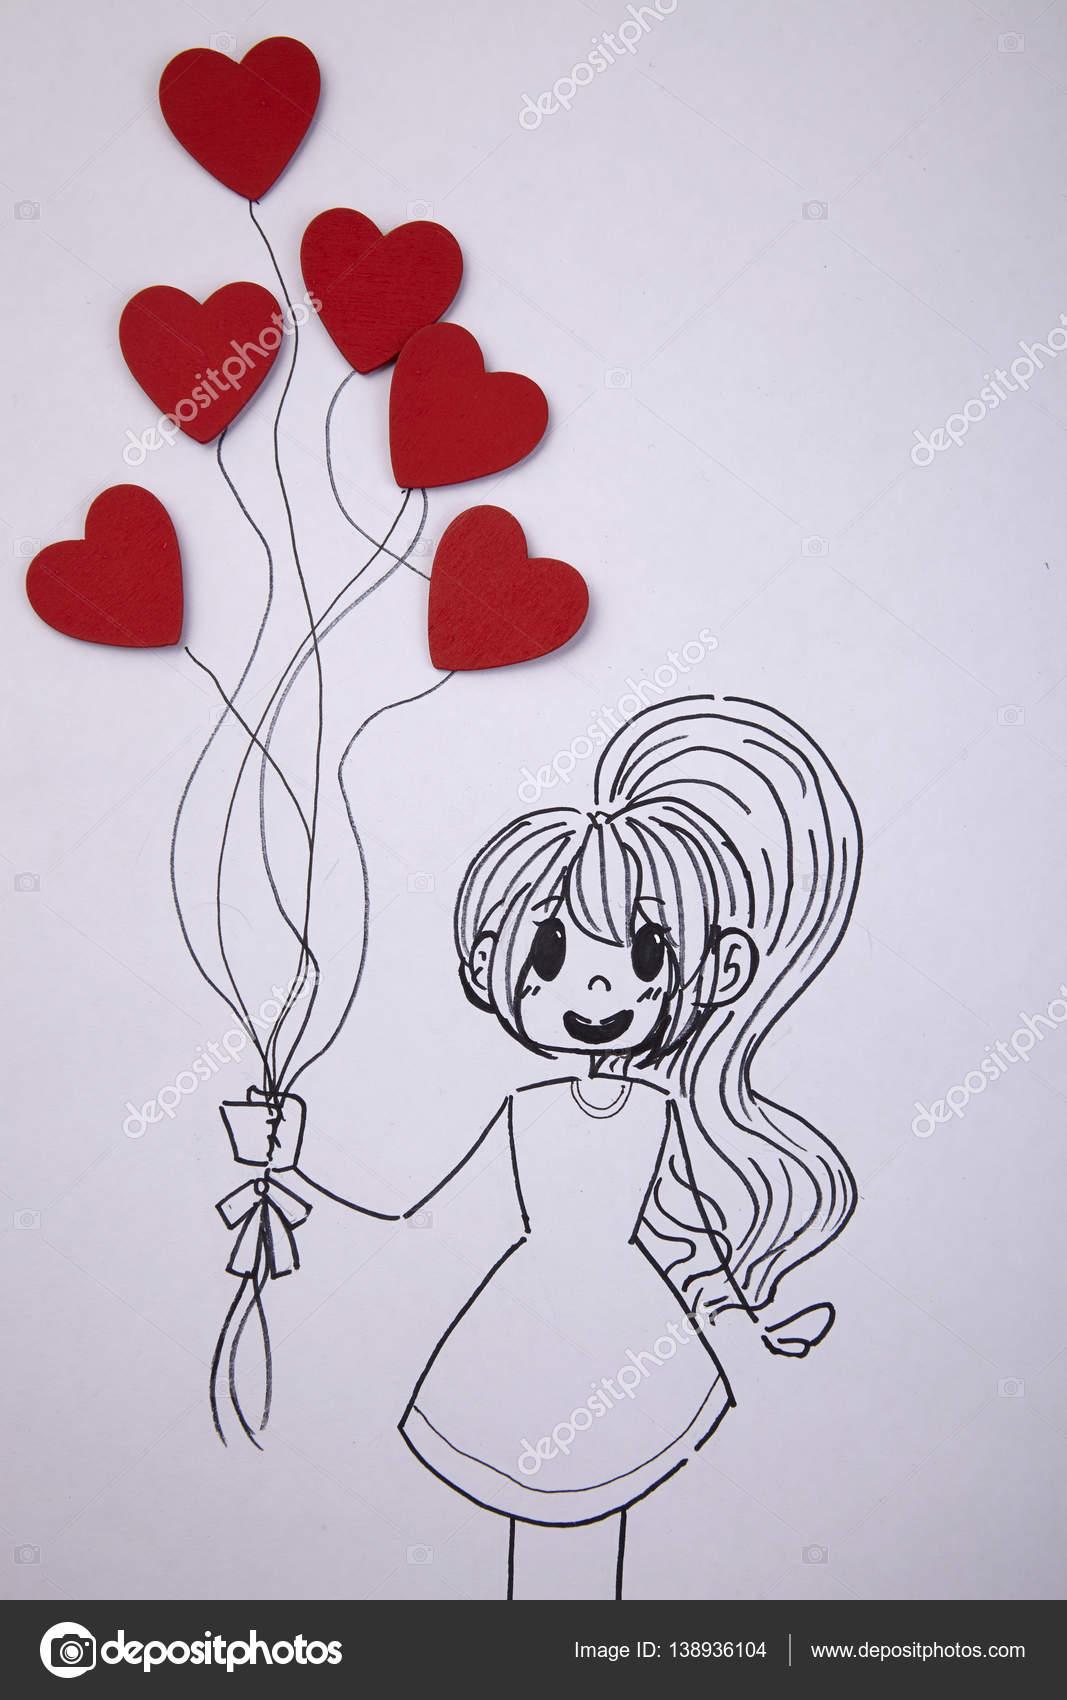 1067x1700 Girl Holding Heart Shaped Balloons Stock Photo Eskaylim